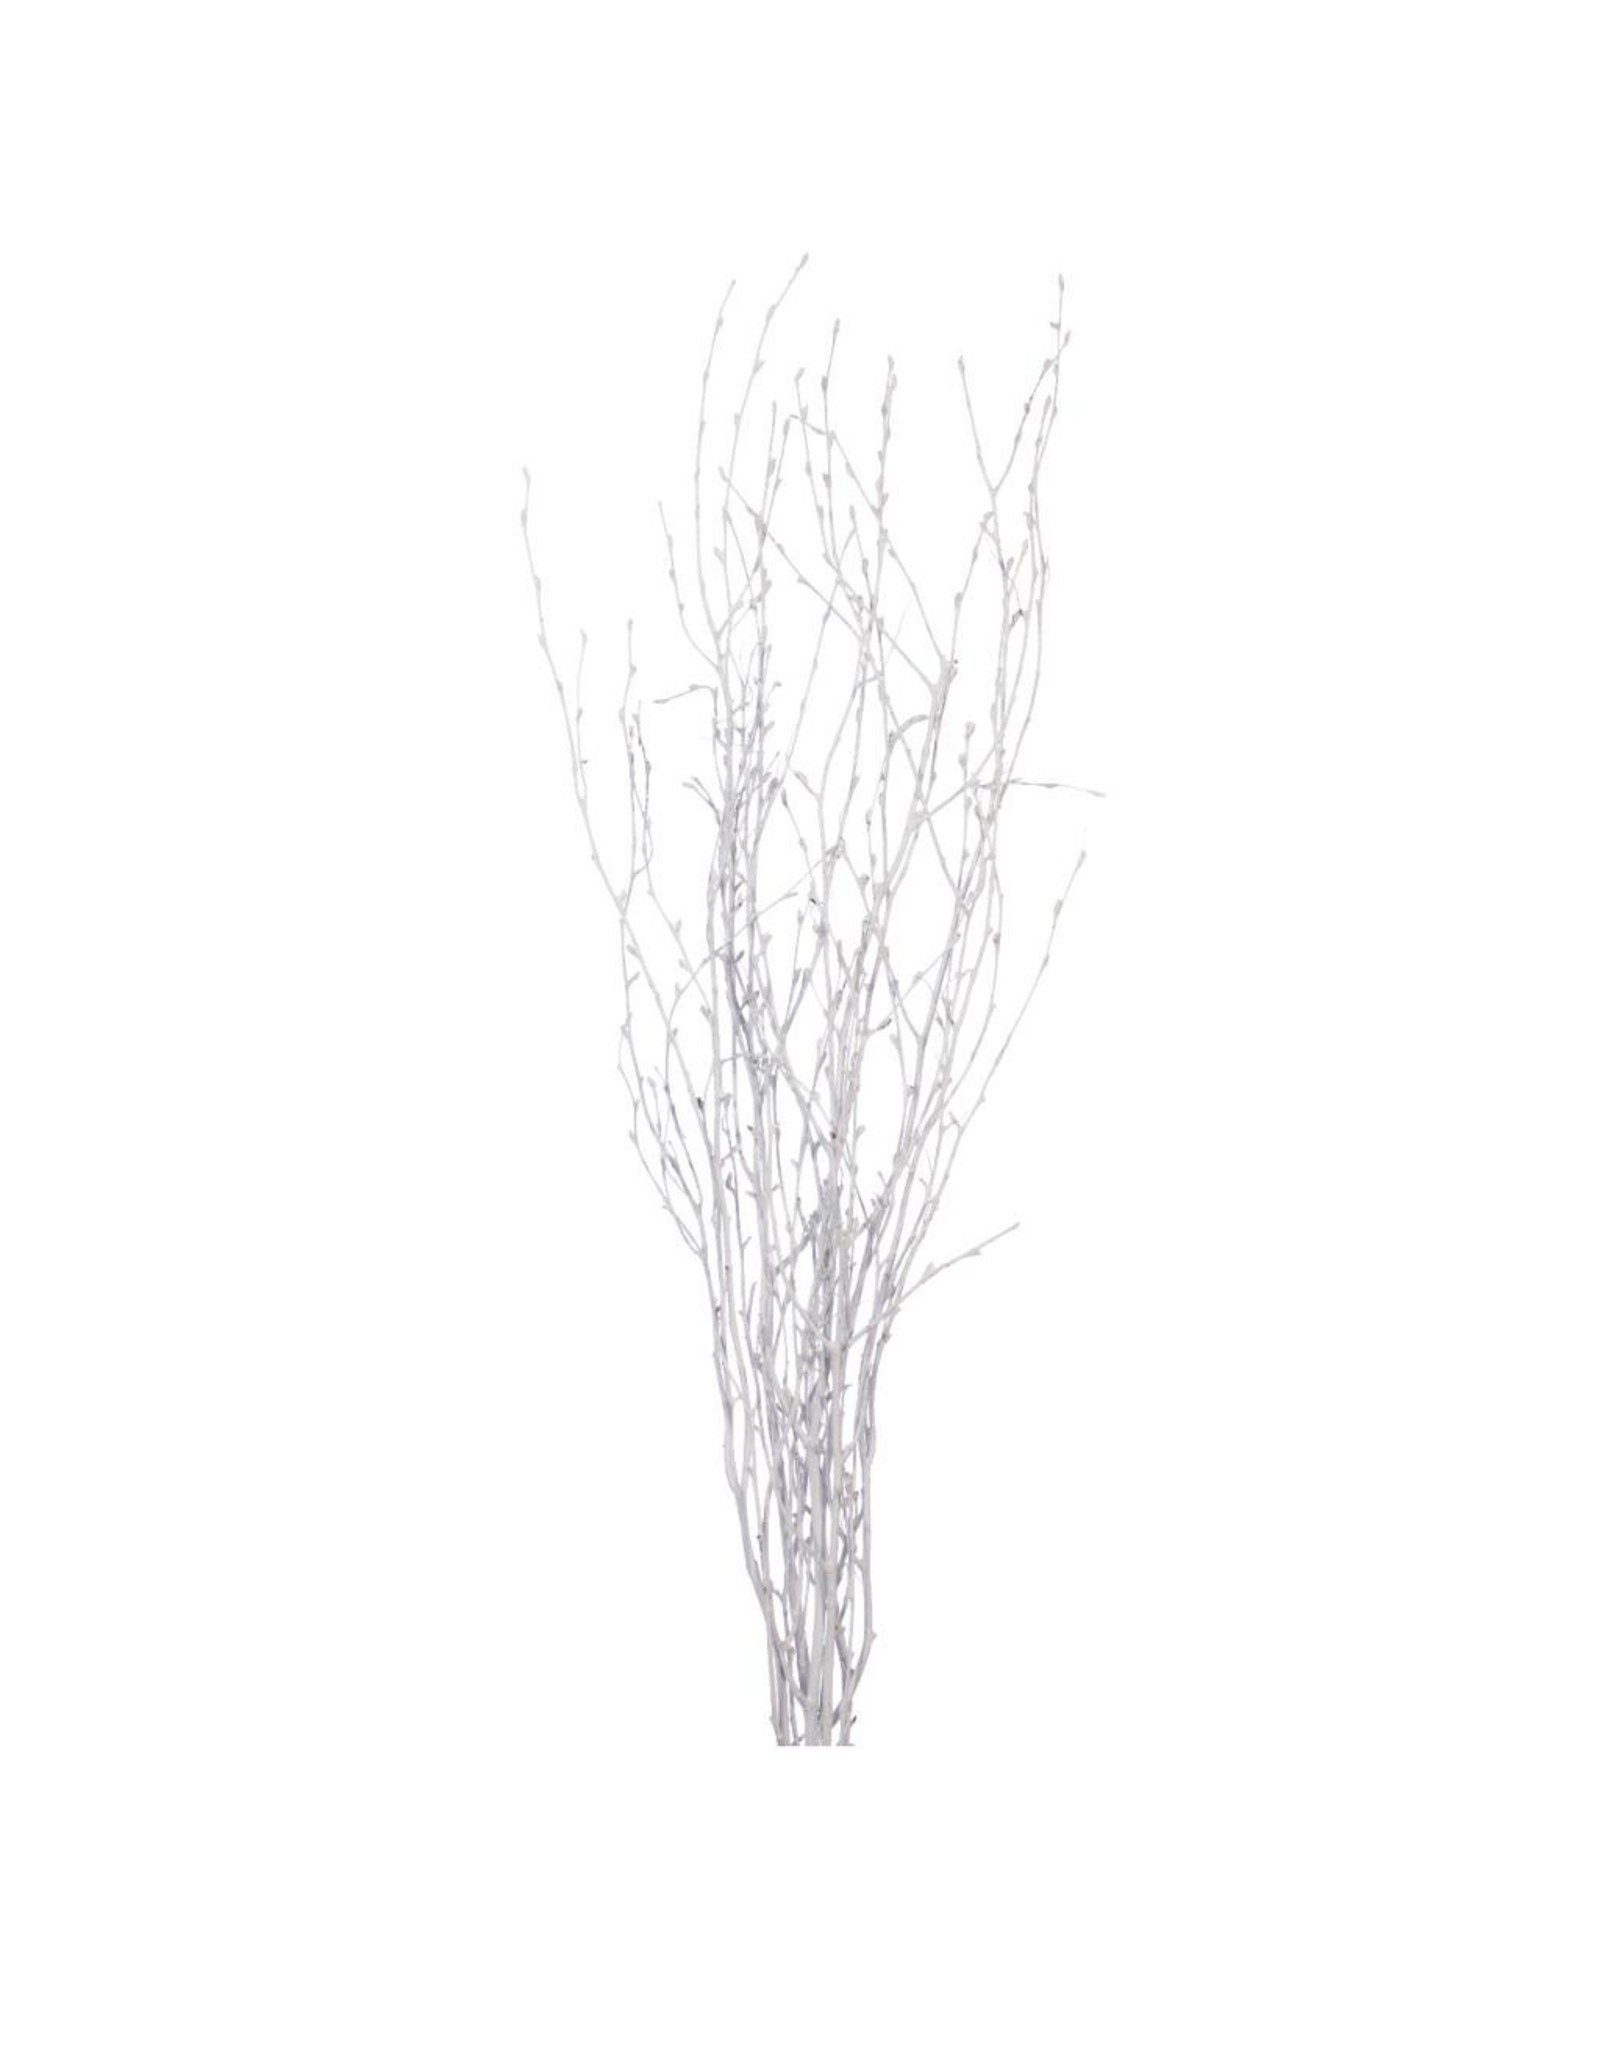 LDD Birch 75cm 5pc SB white x 6